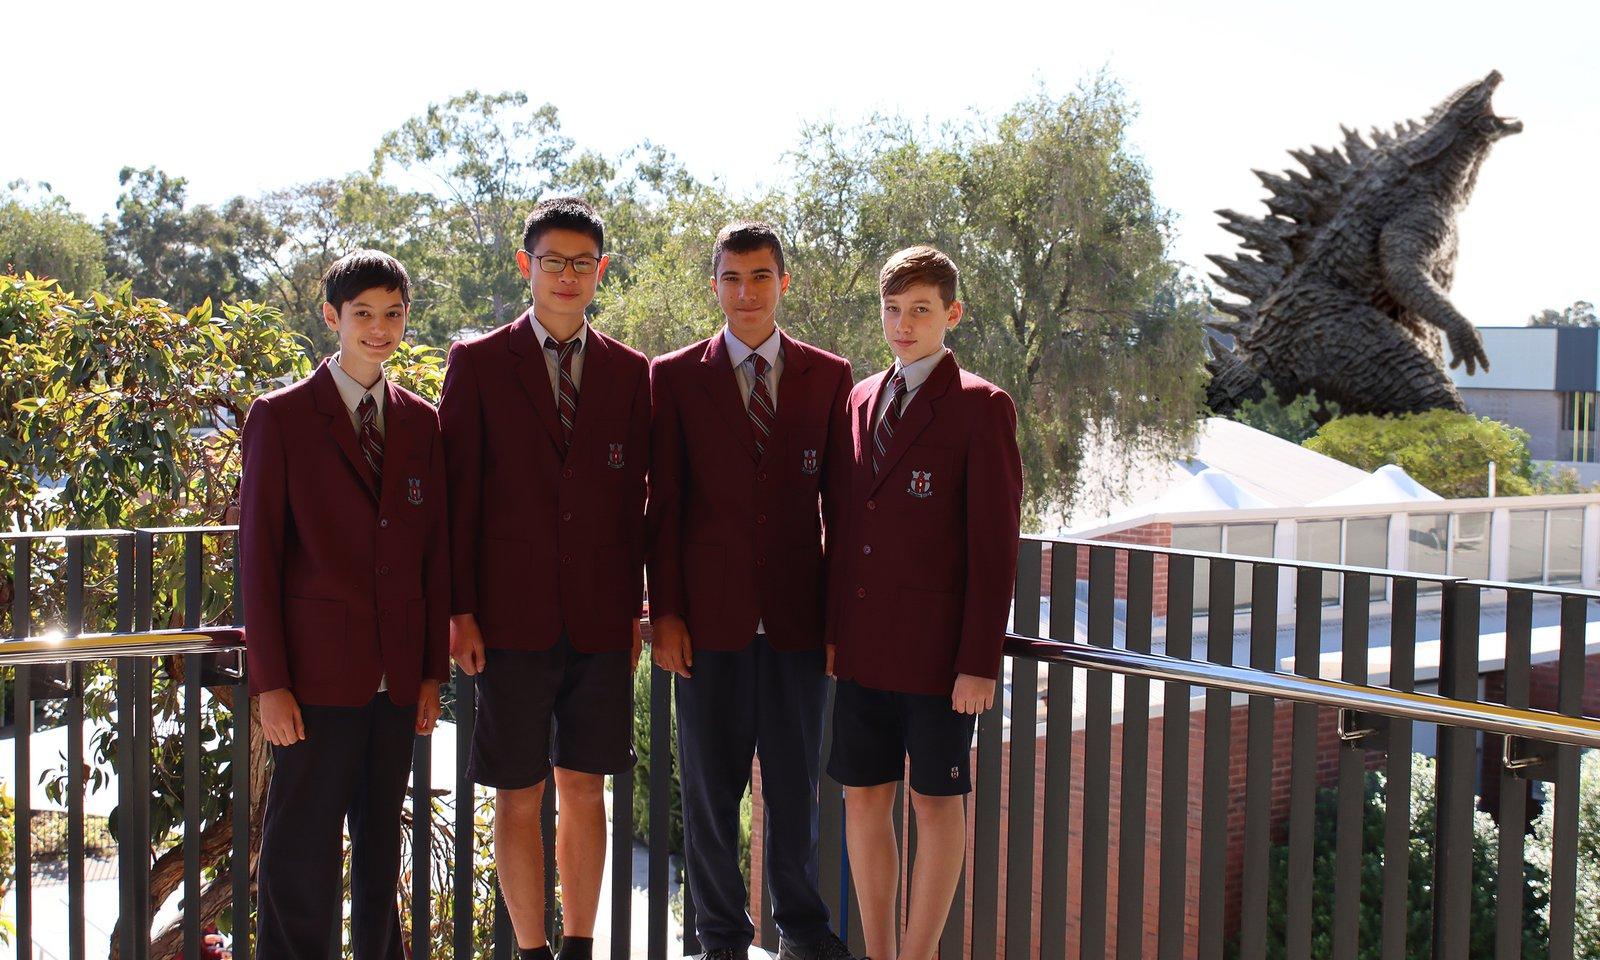 Isaac N., Ethan P., Reuben R. and Alex S. - Finalists, 2021 University of Sydney Sleek Geeks Science Eureka Prize — Secondary